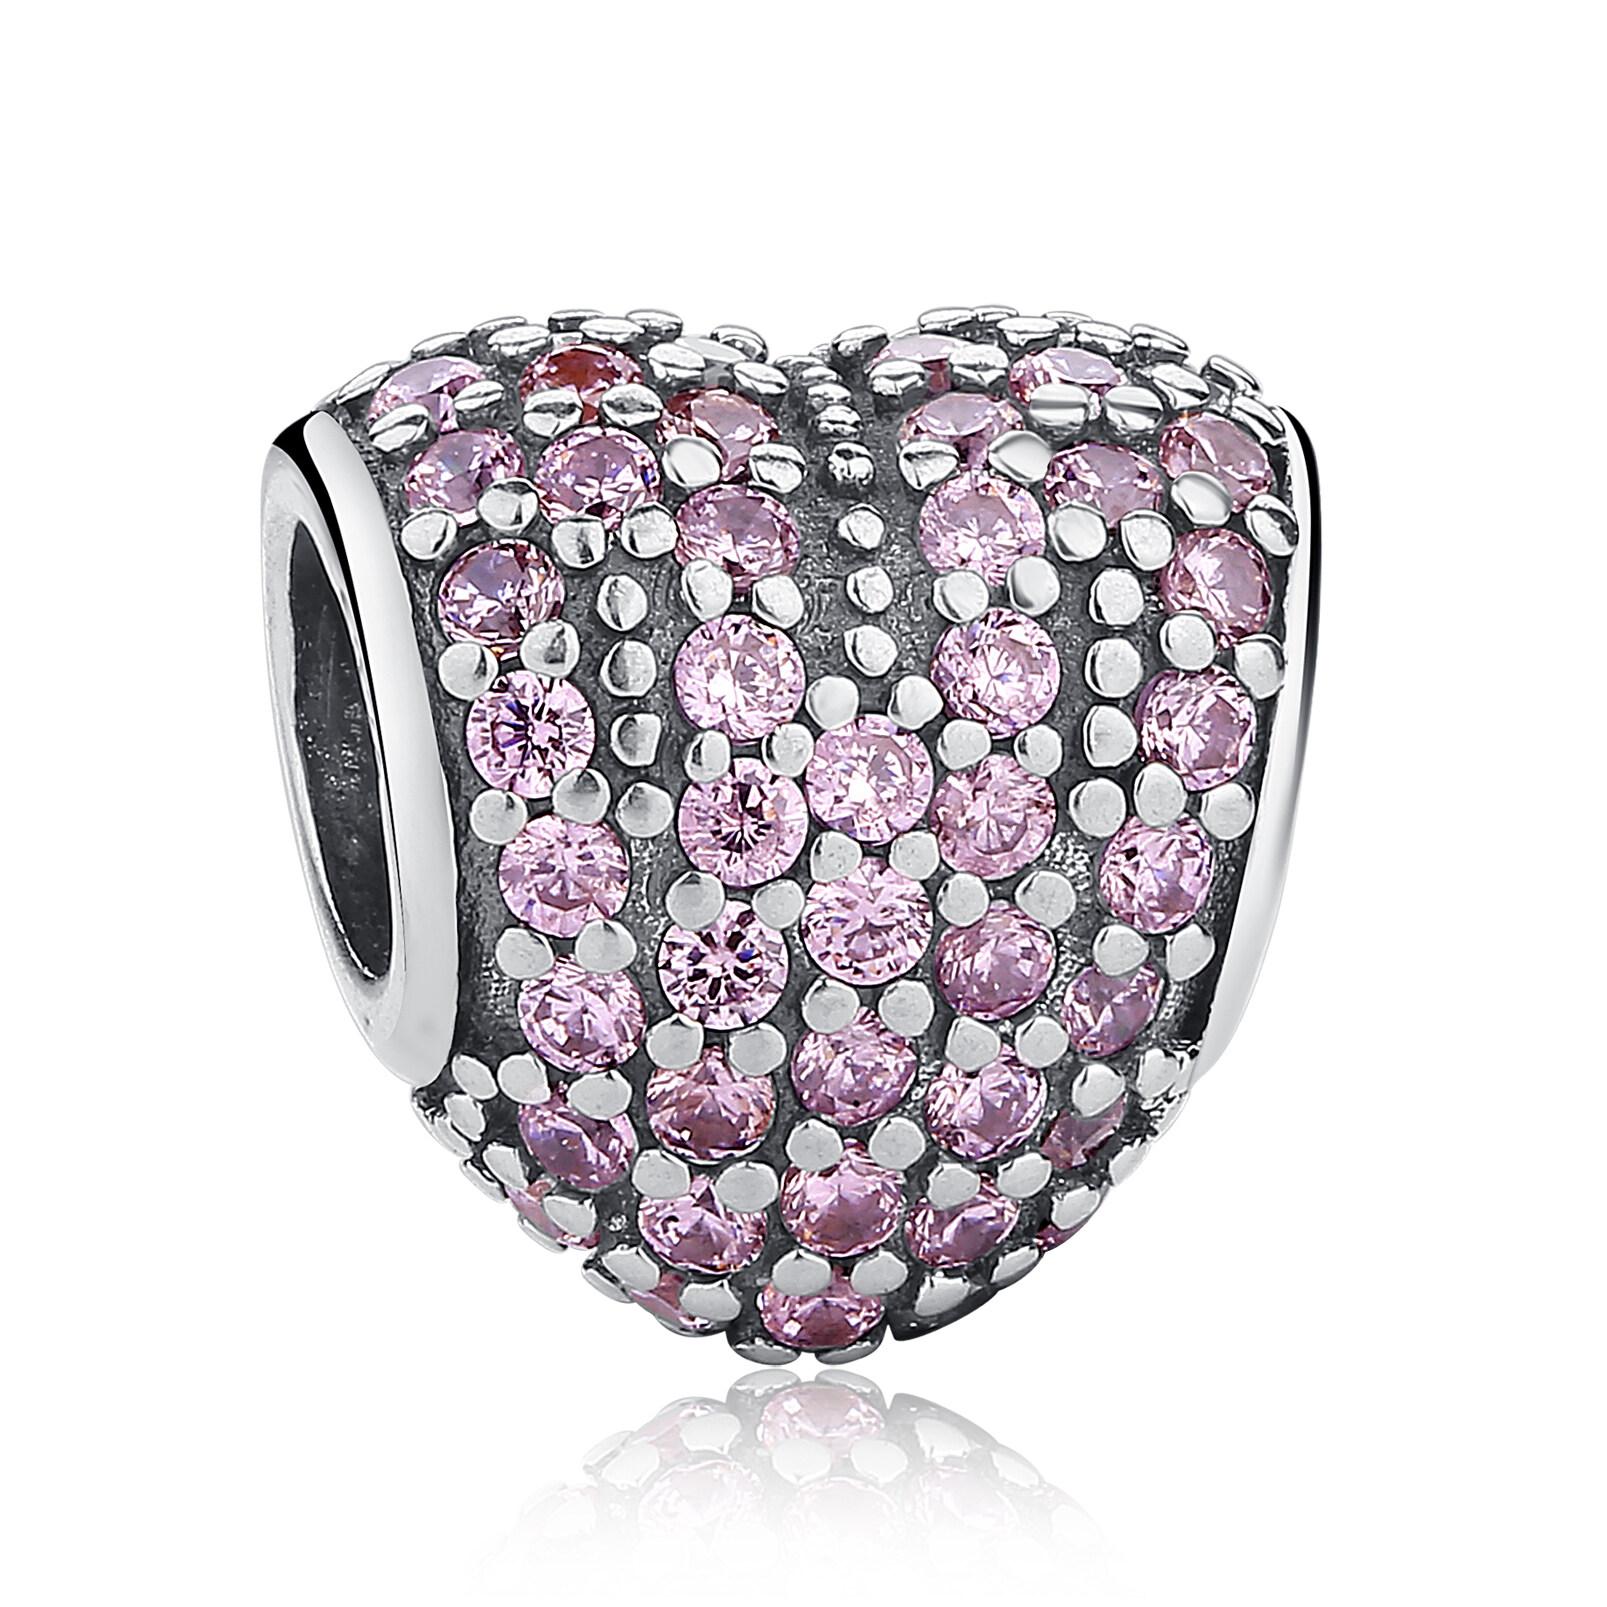 Harga Hadiah Untuk Kekasih Yang Mempesona 925 Sterling Silver Heart Shape Charm Fit Gelang Dengan Pink Cubic Zirkonia Perhiasan Membuat Pas055 Bamoer Asli